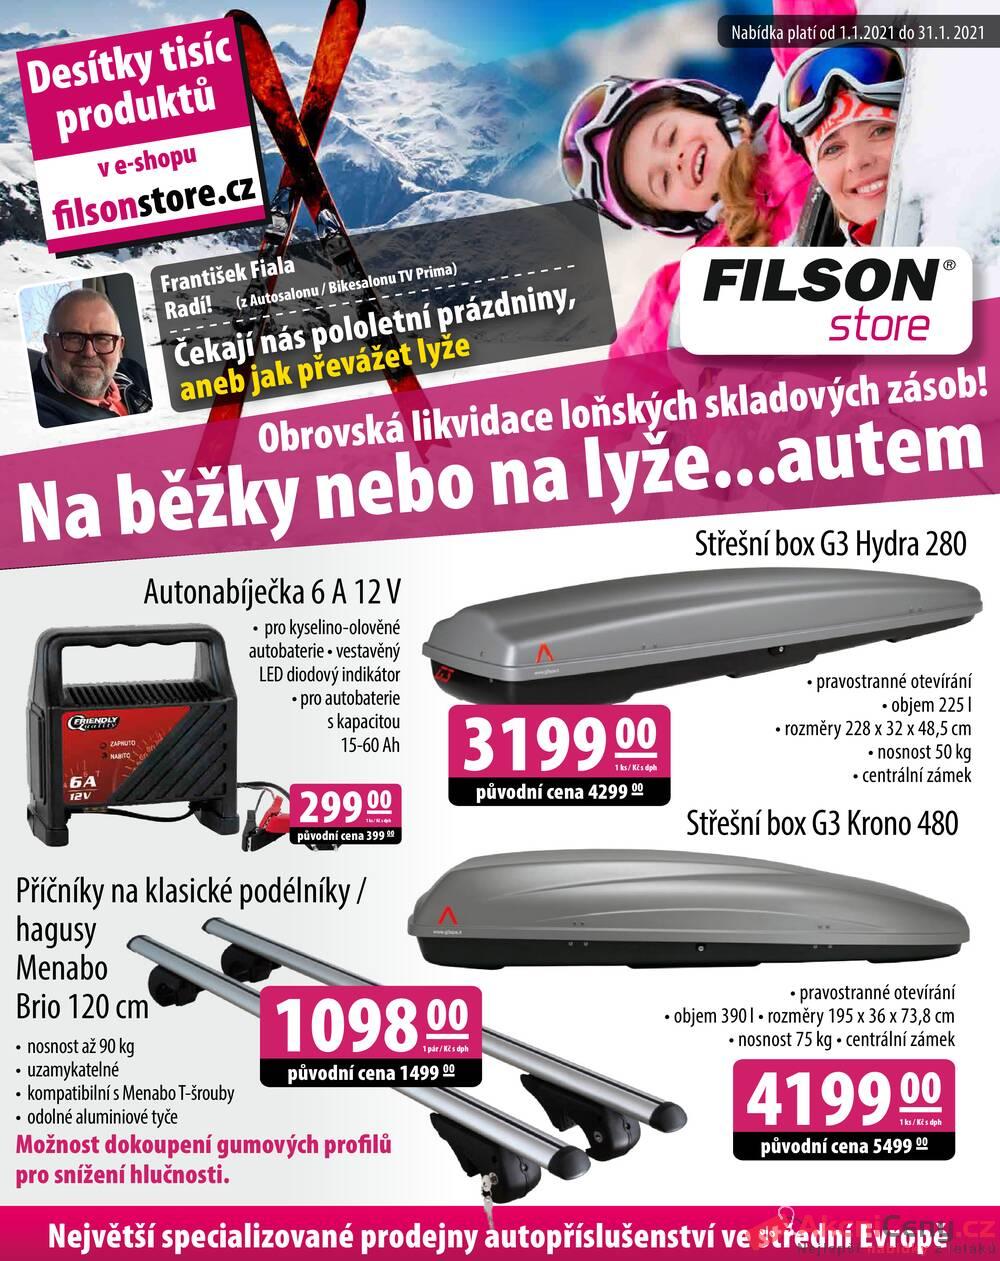 Leták Filson Store - Filson Store od 1.1. do 31.1.2021 - strana 1